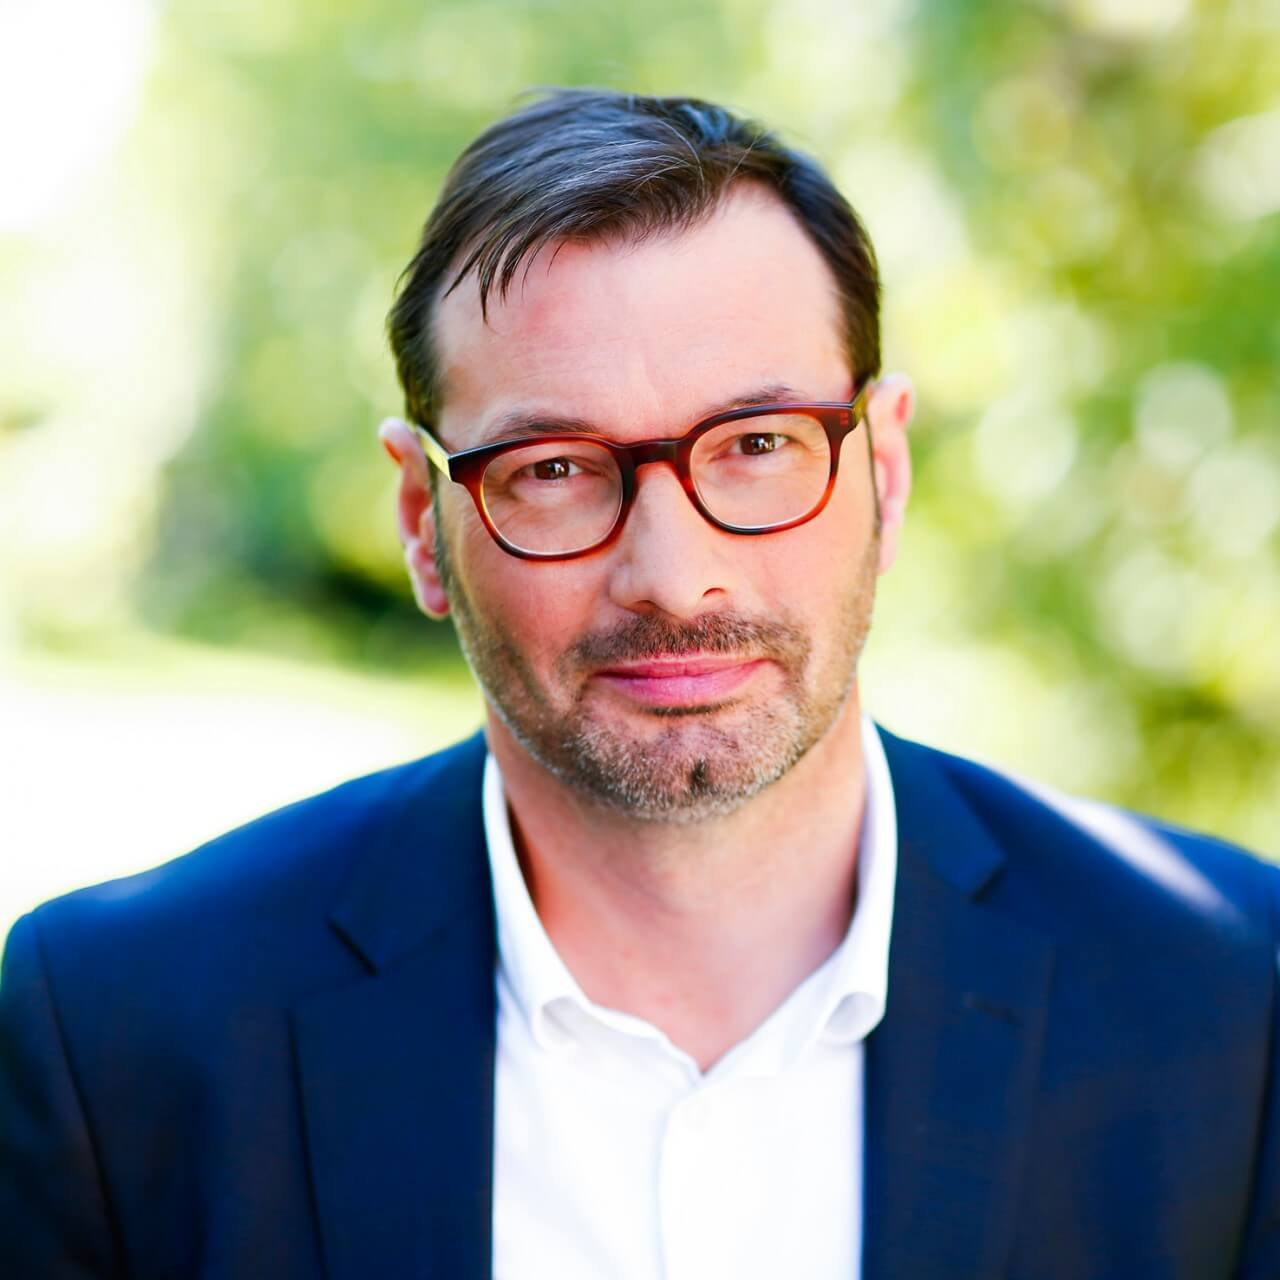 Stefan Stremersch